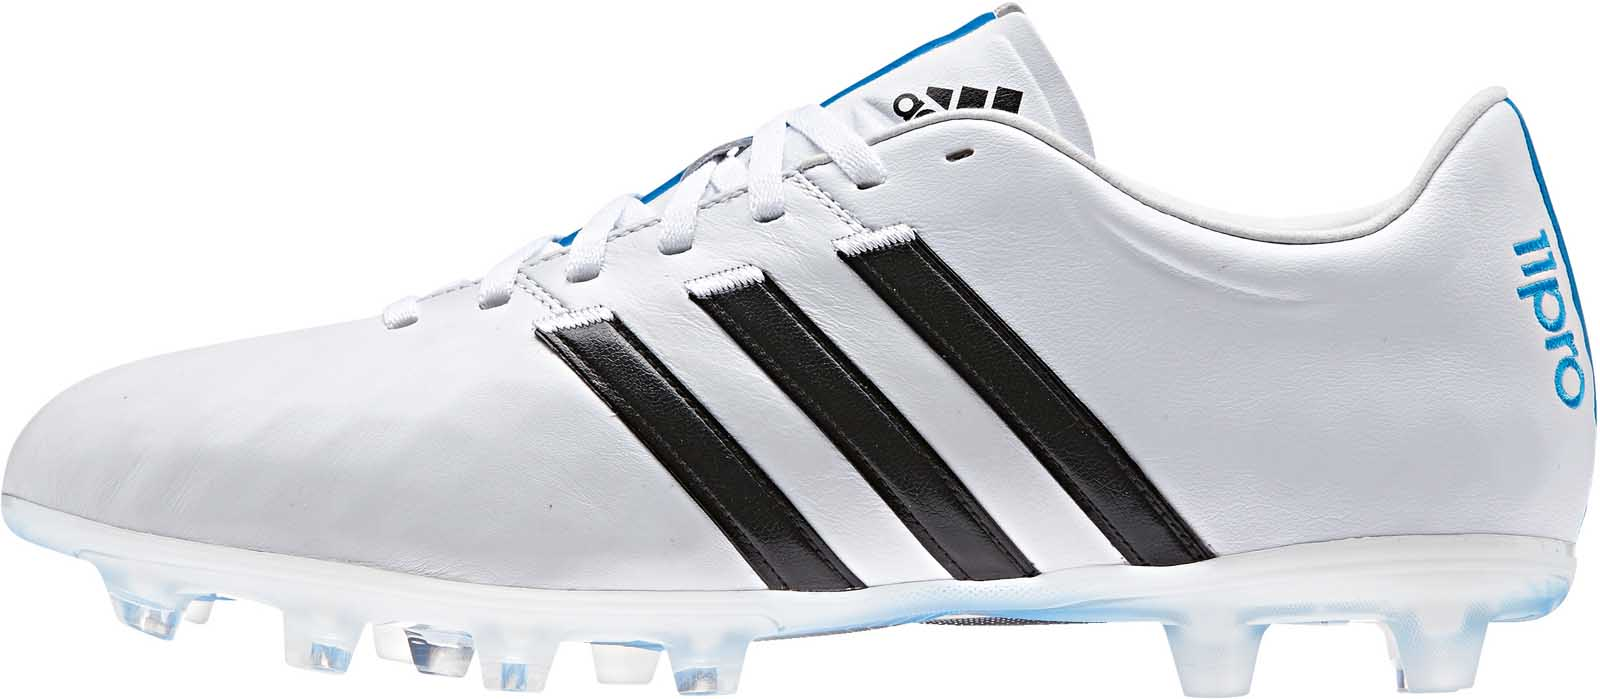 Adidas Black On Black Soccer Shoes